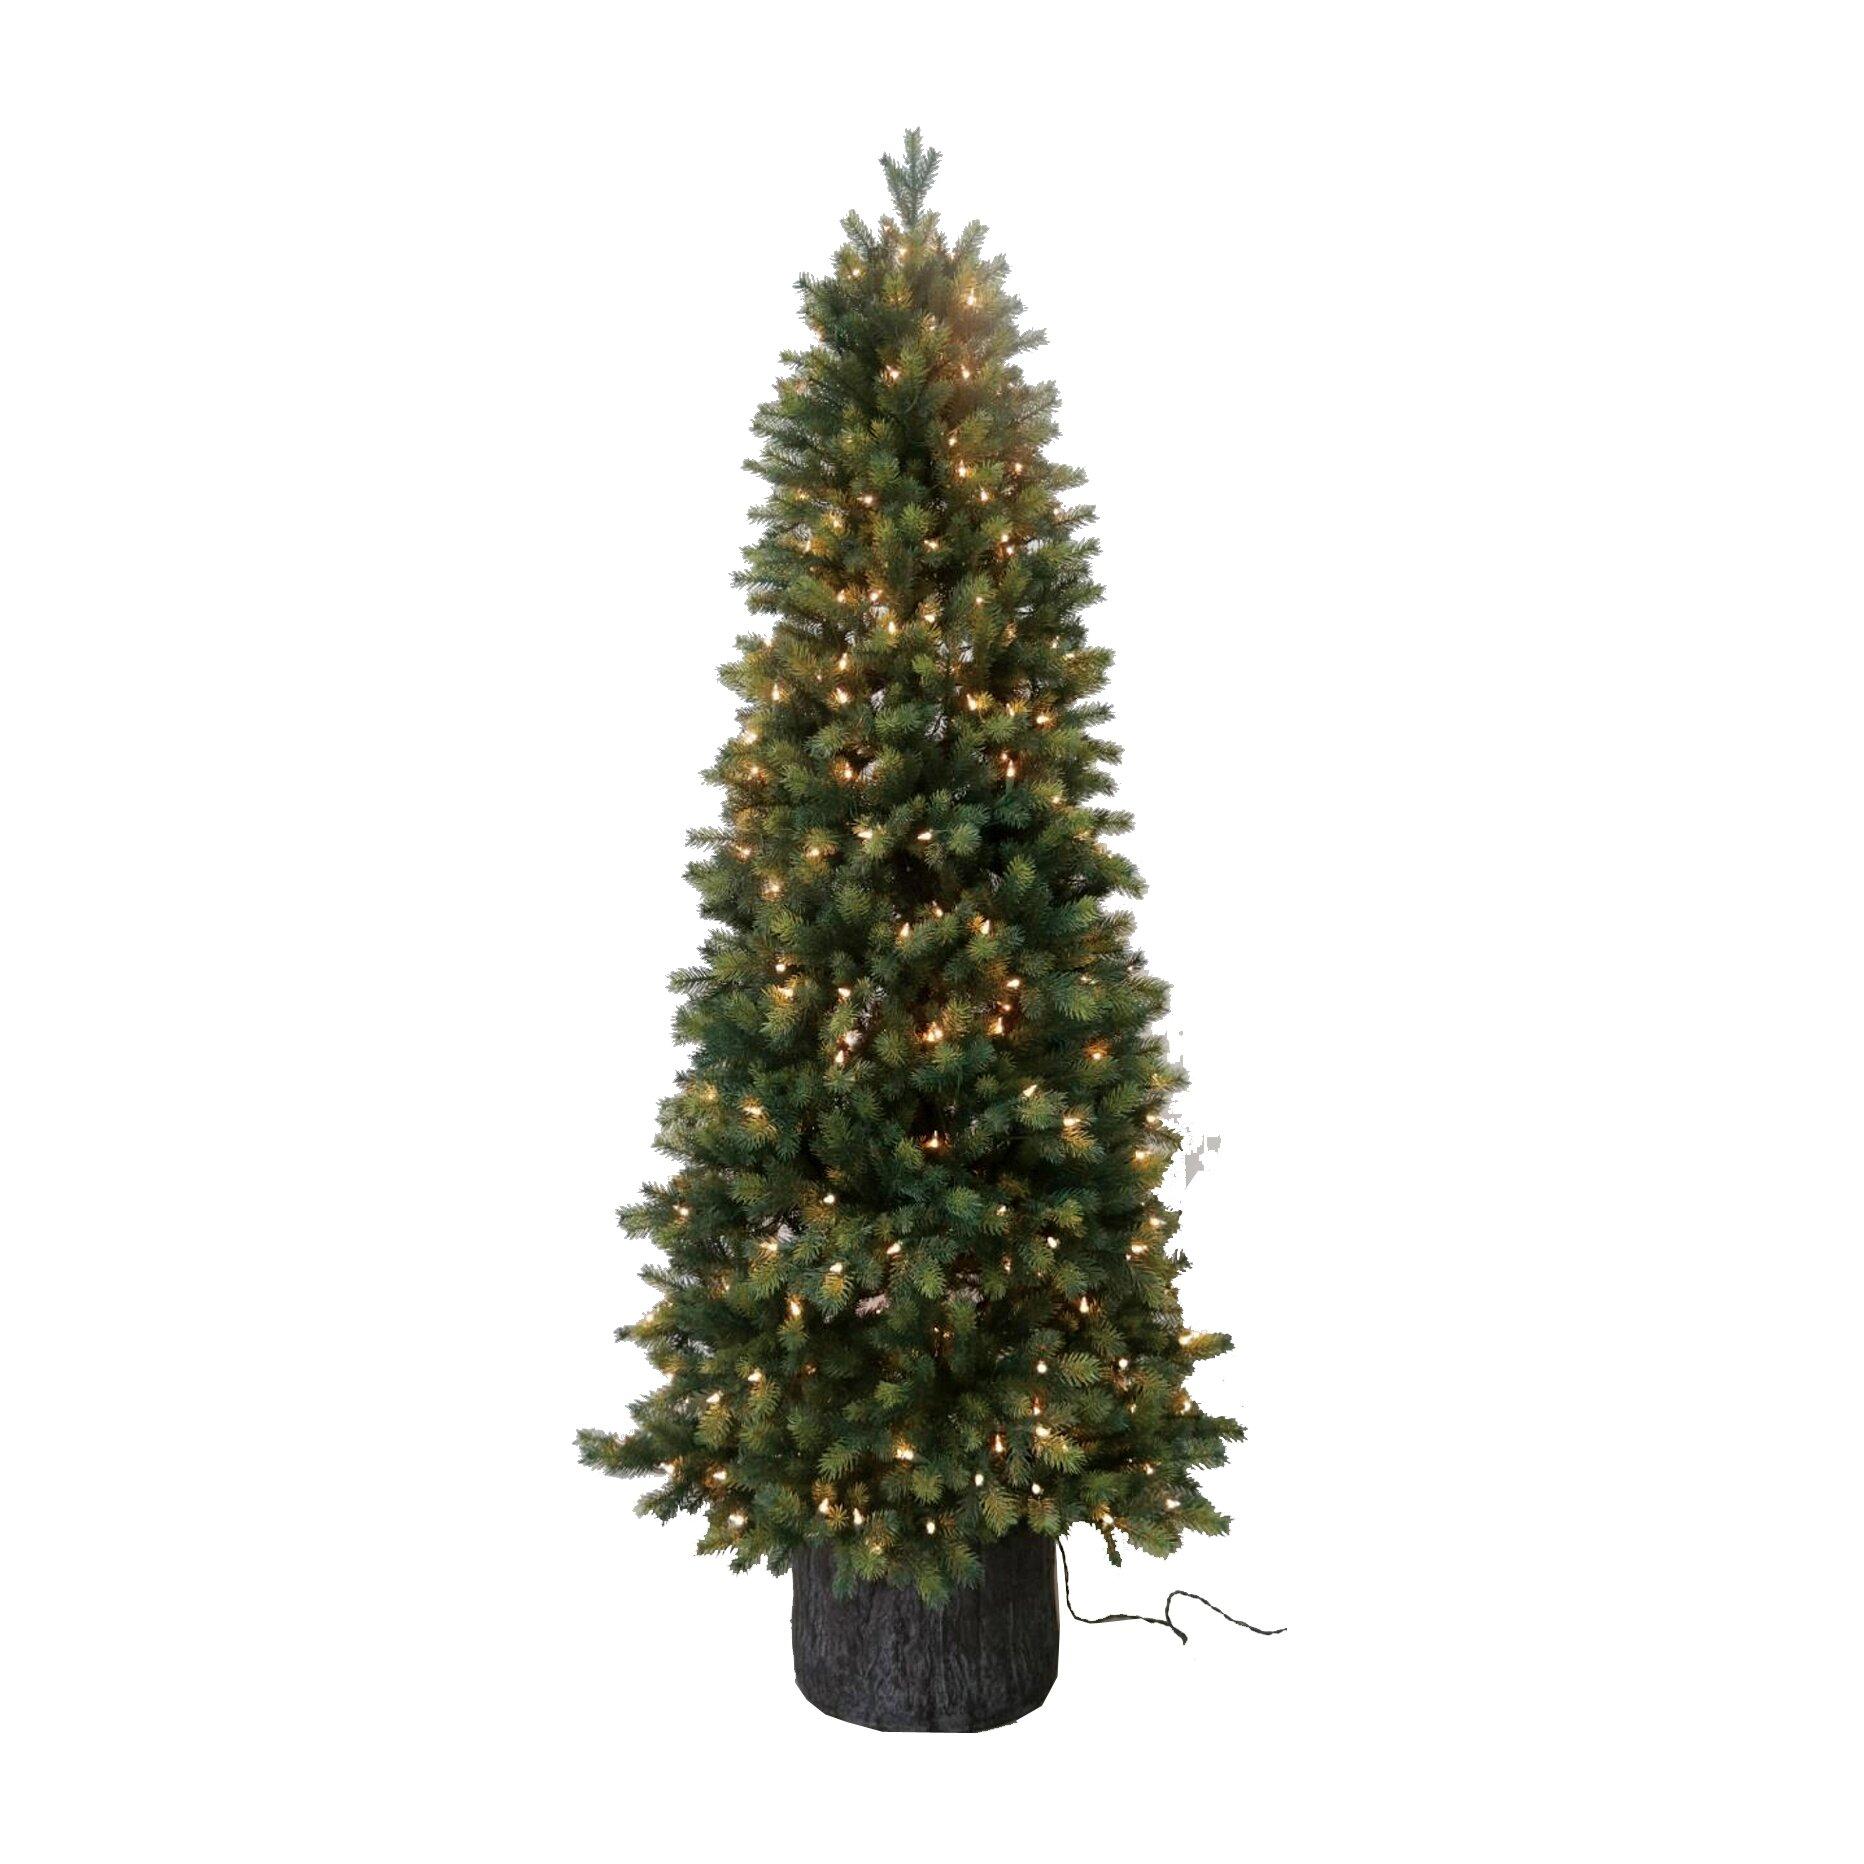 Santa's Workshop 6' Green Spruce Pine Artificial Christmas